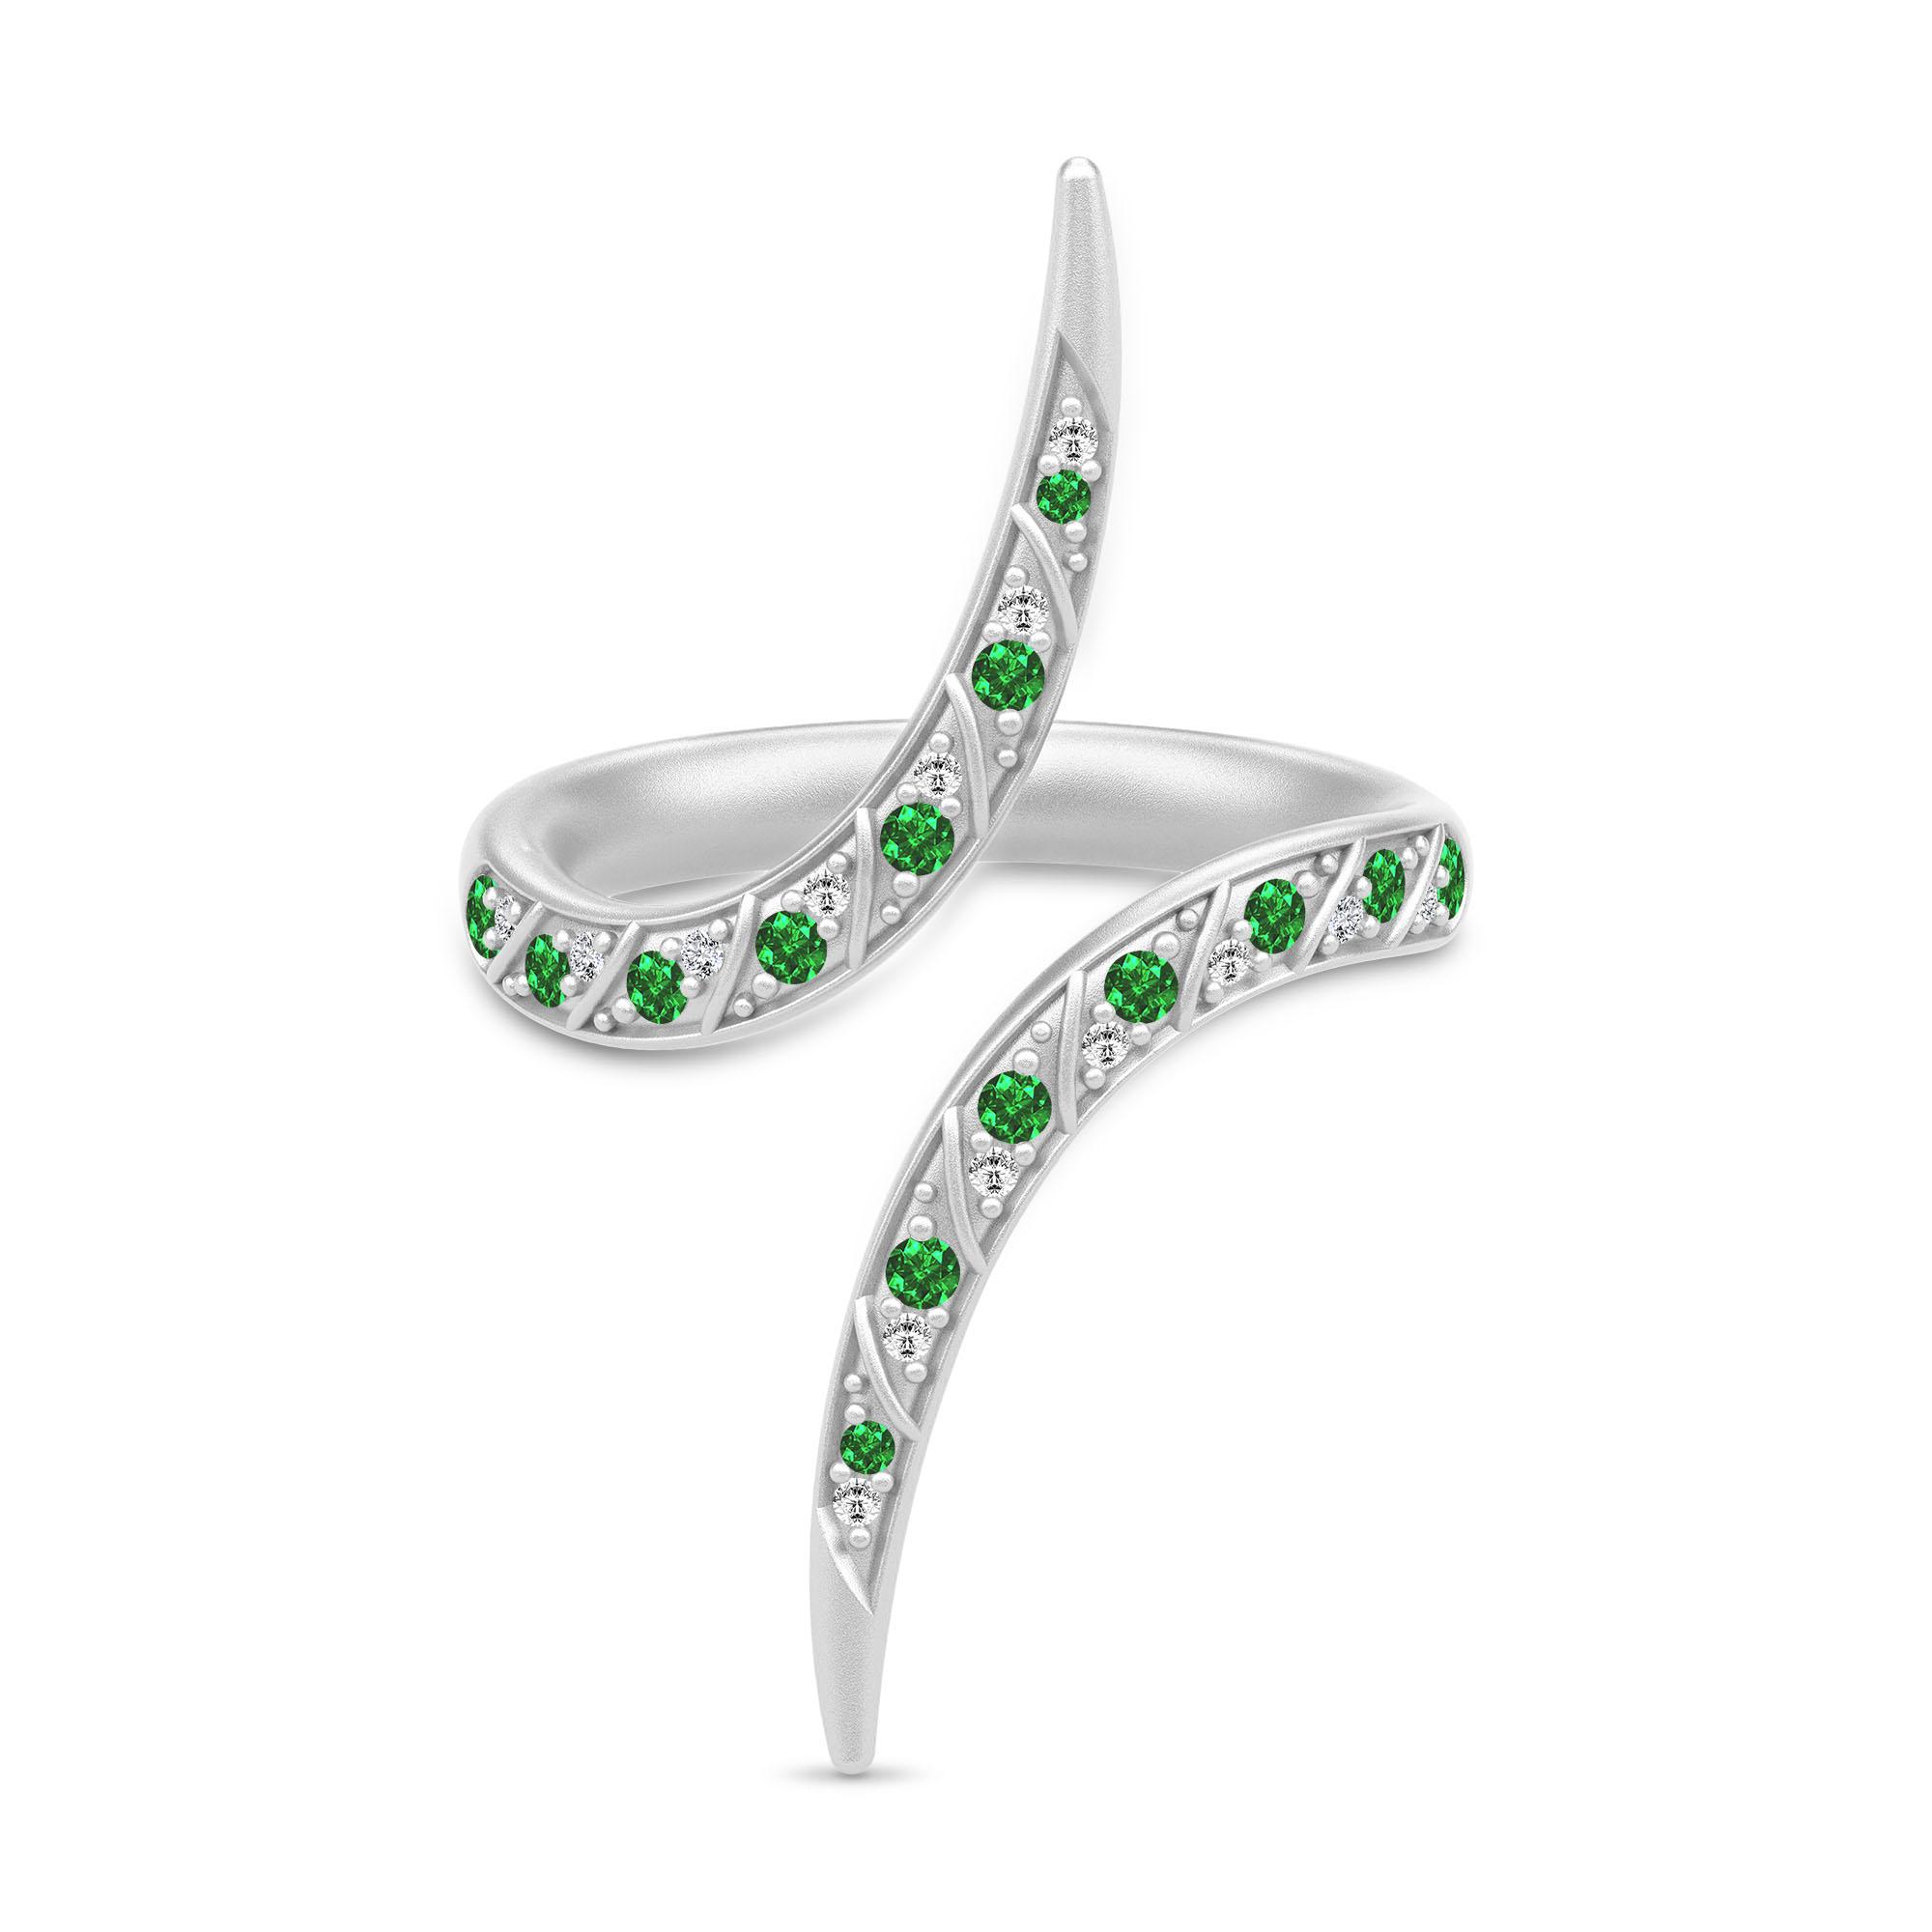 Julie Sandlau Peacock ring i sølv med grønne cz